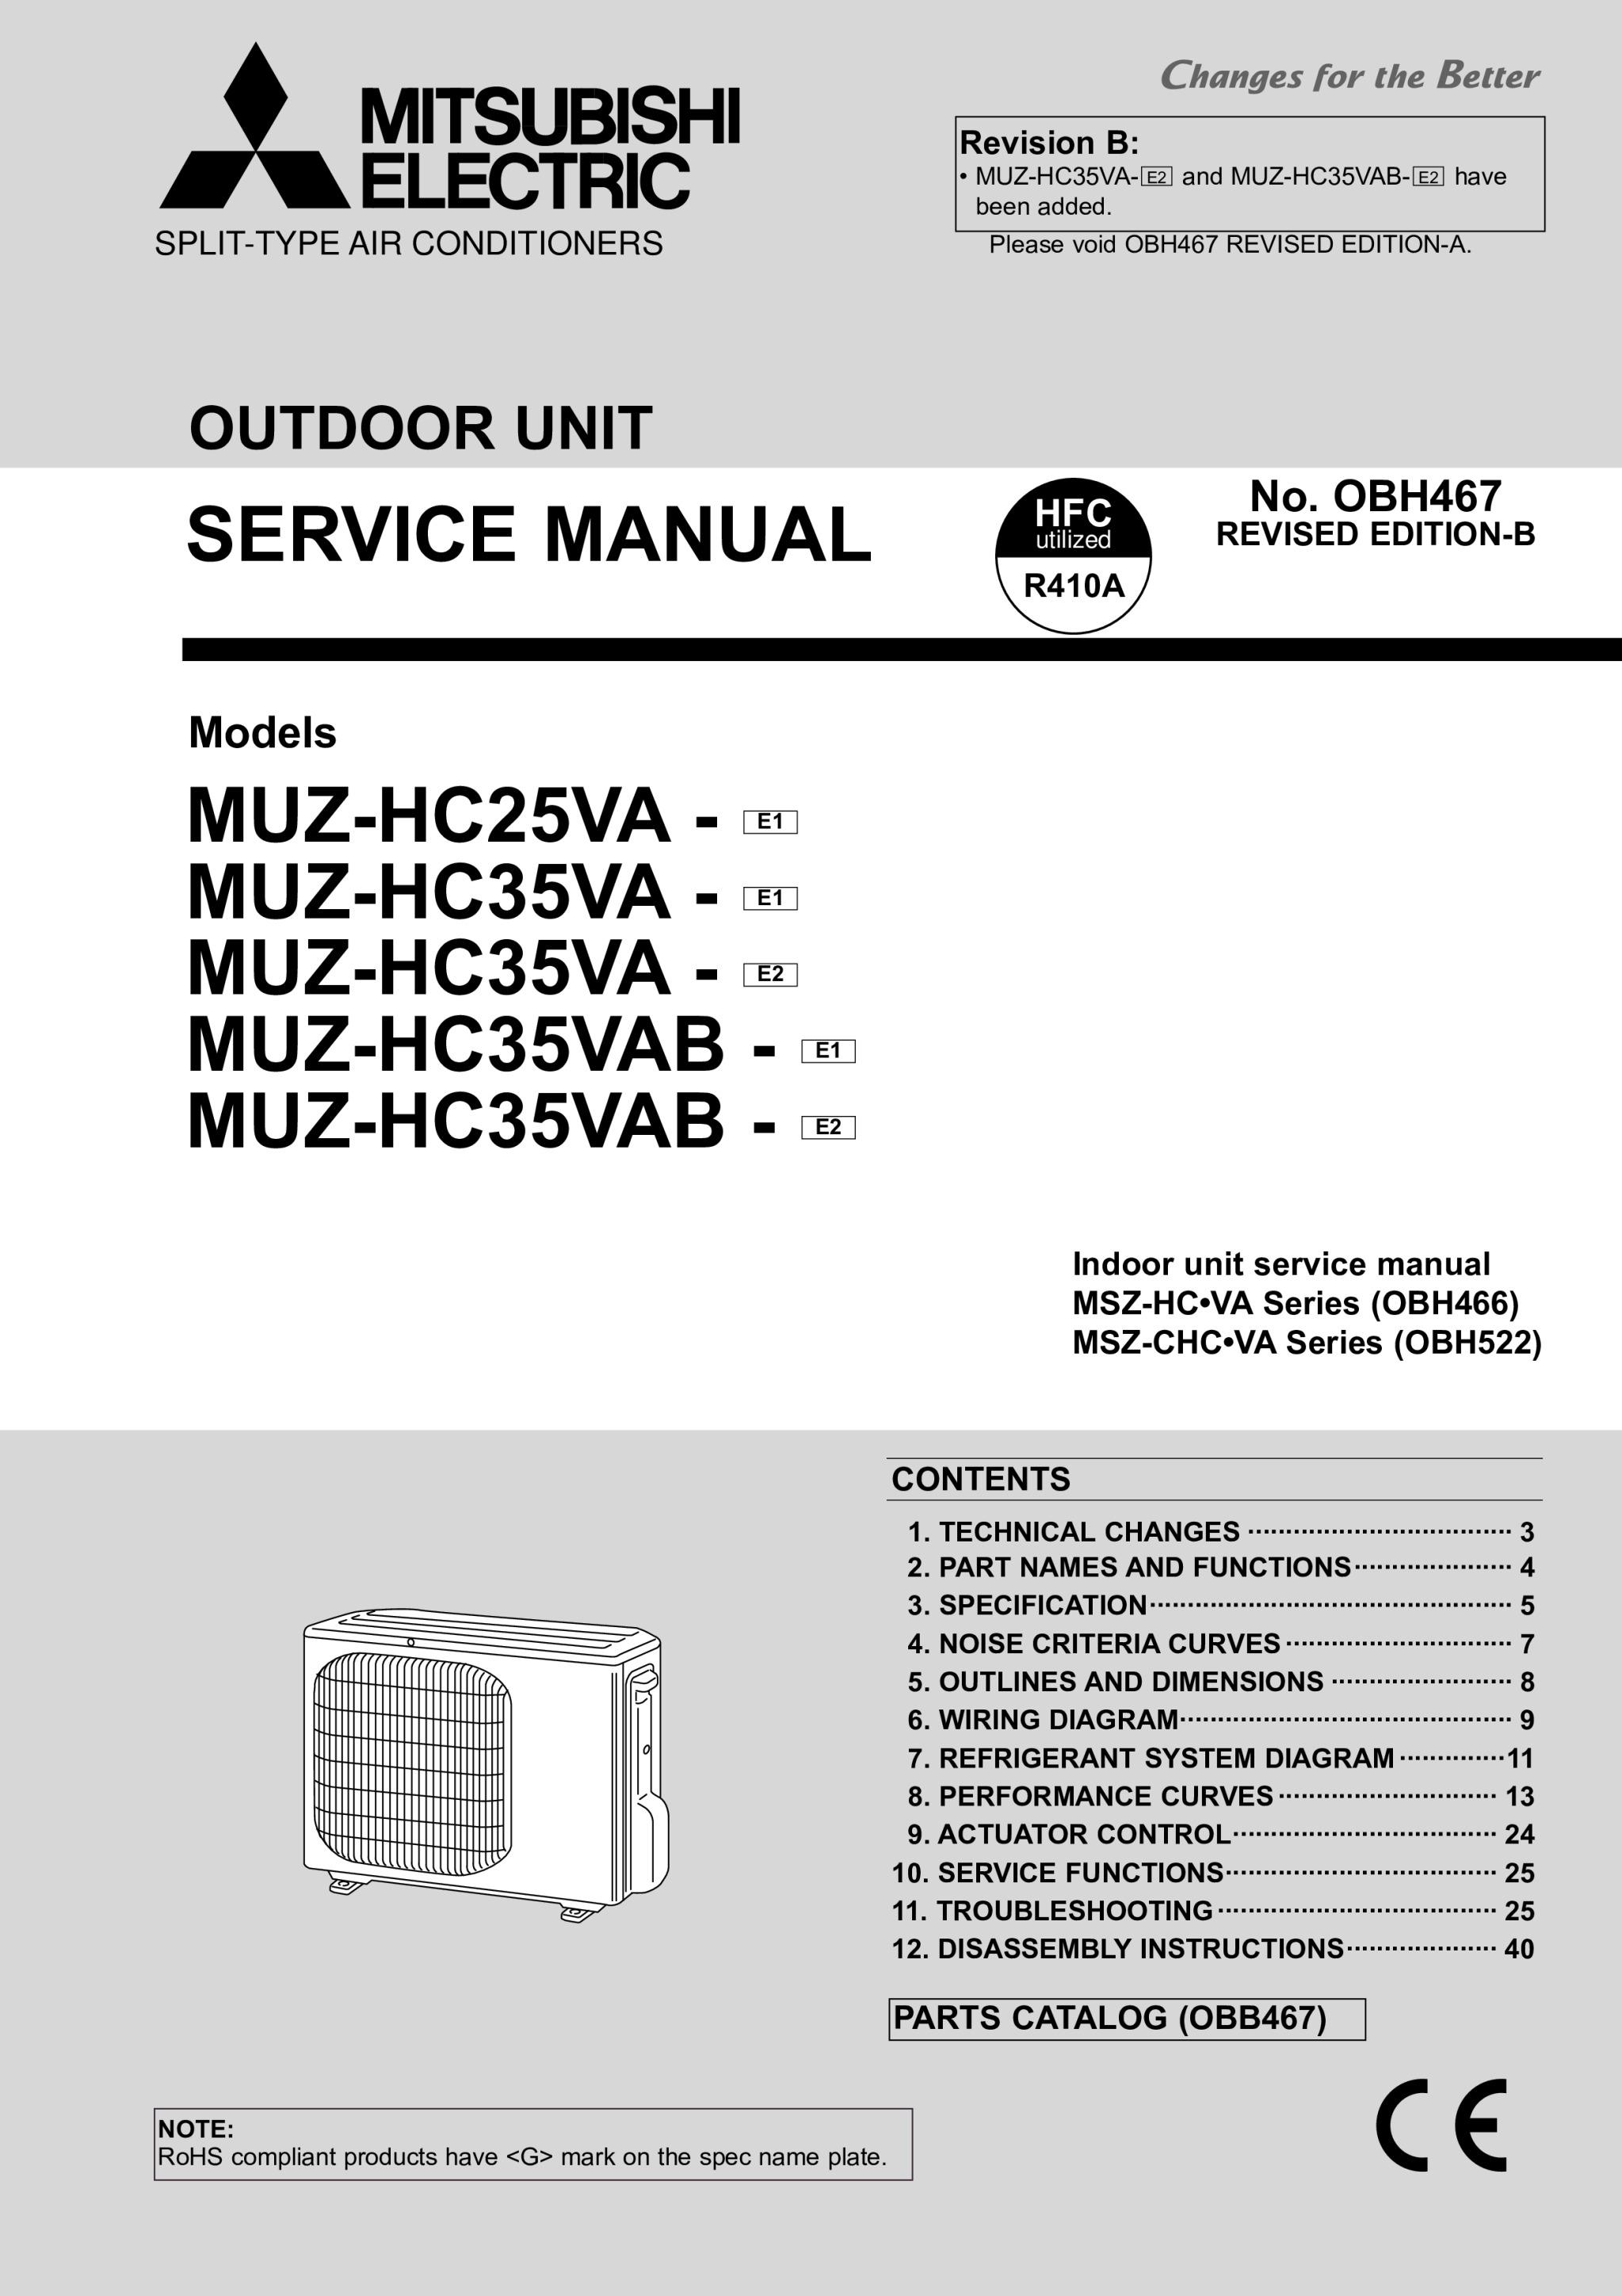 Marvellous Mitsubishi Fx1s Wiring Diagram Images - Best Image ...